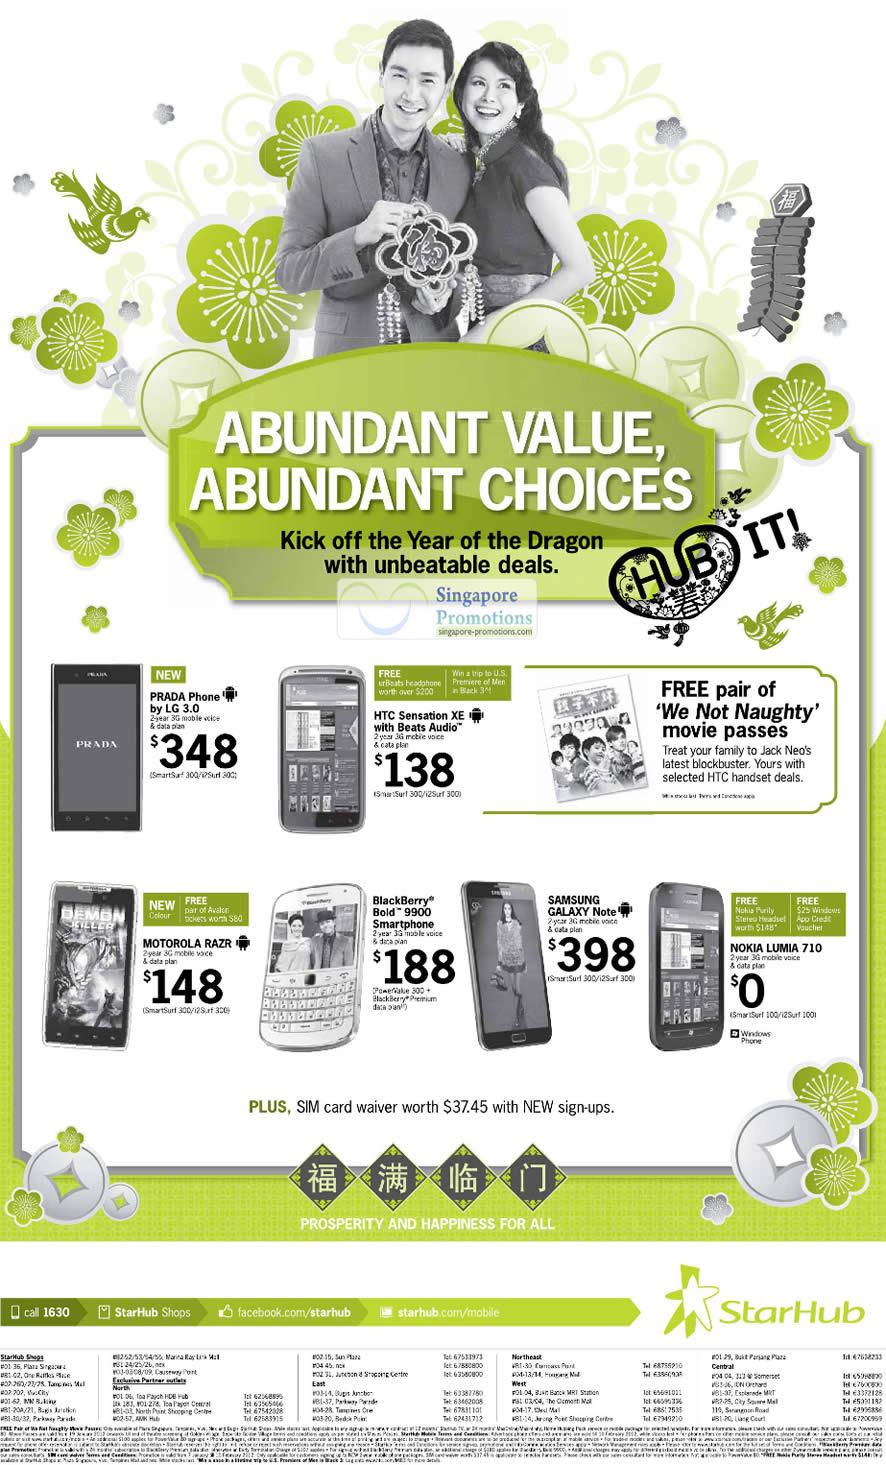 Prada Phone by LG 3.0, HTC Sensation XE, Motorola Razr, Blackberry Bold 9900, Samsung Galaxy Note, Nokia Lumia 710